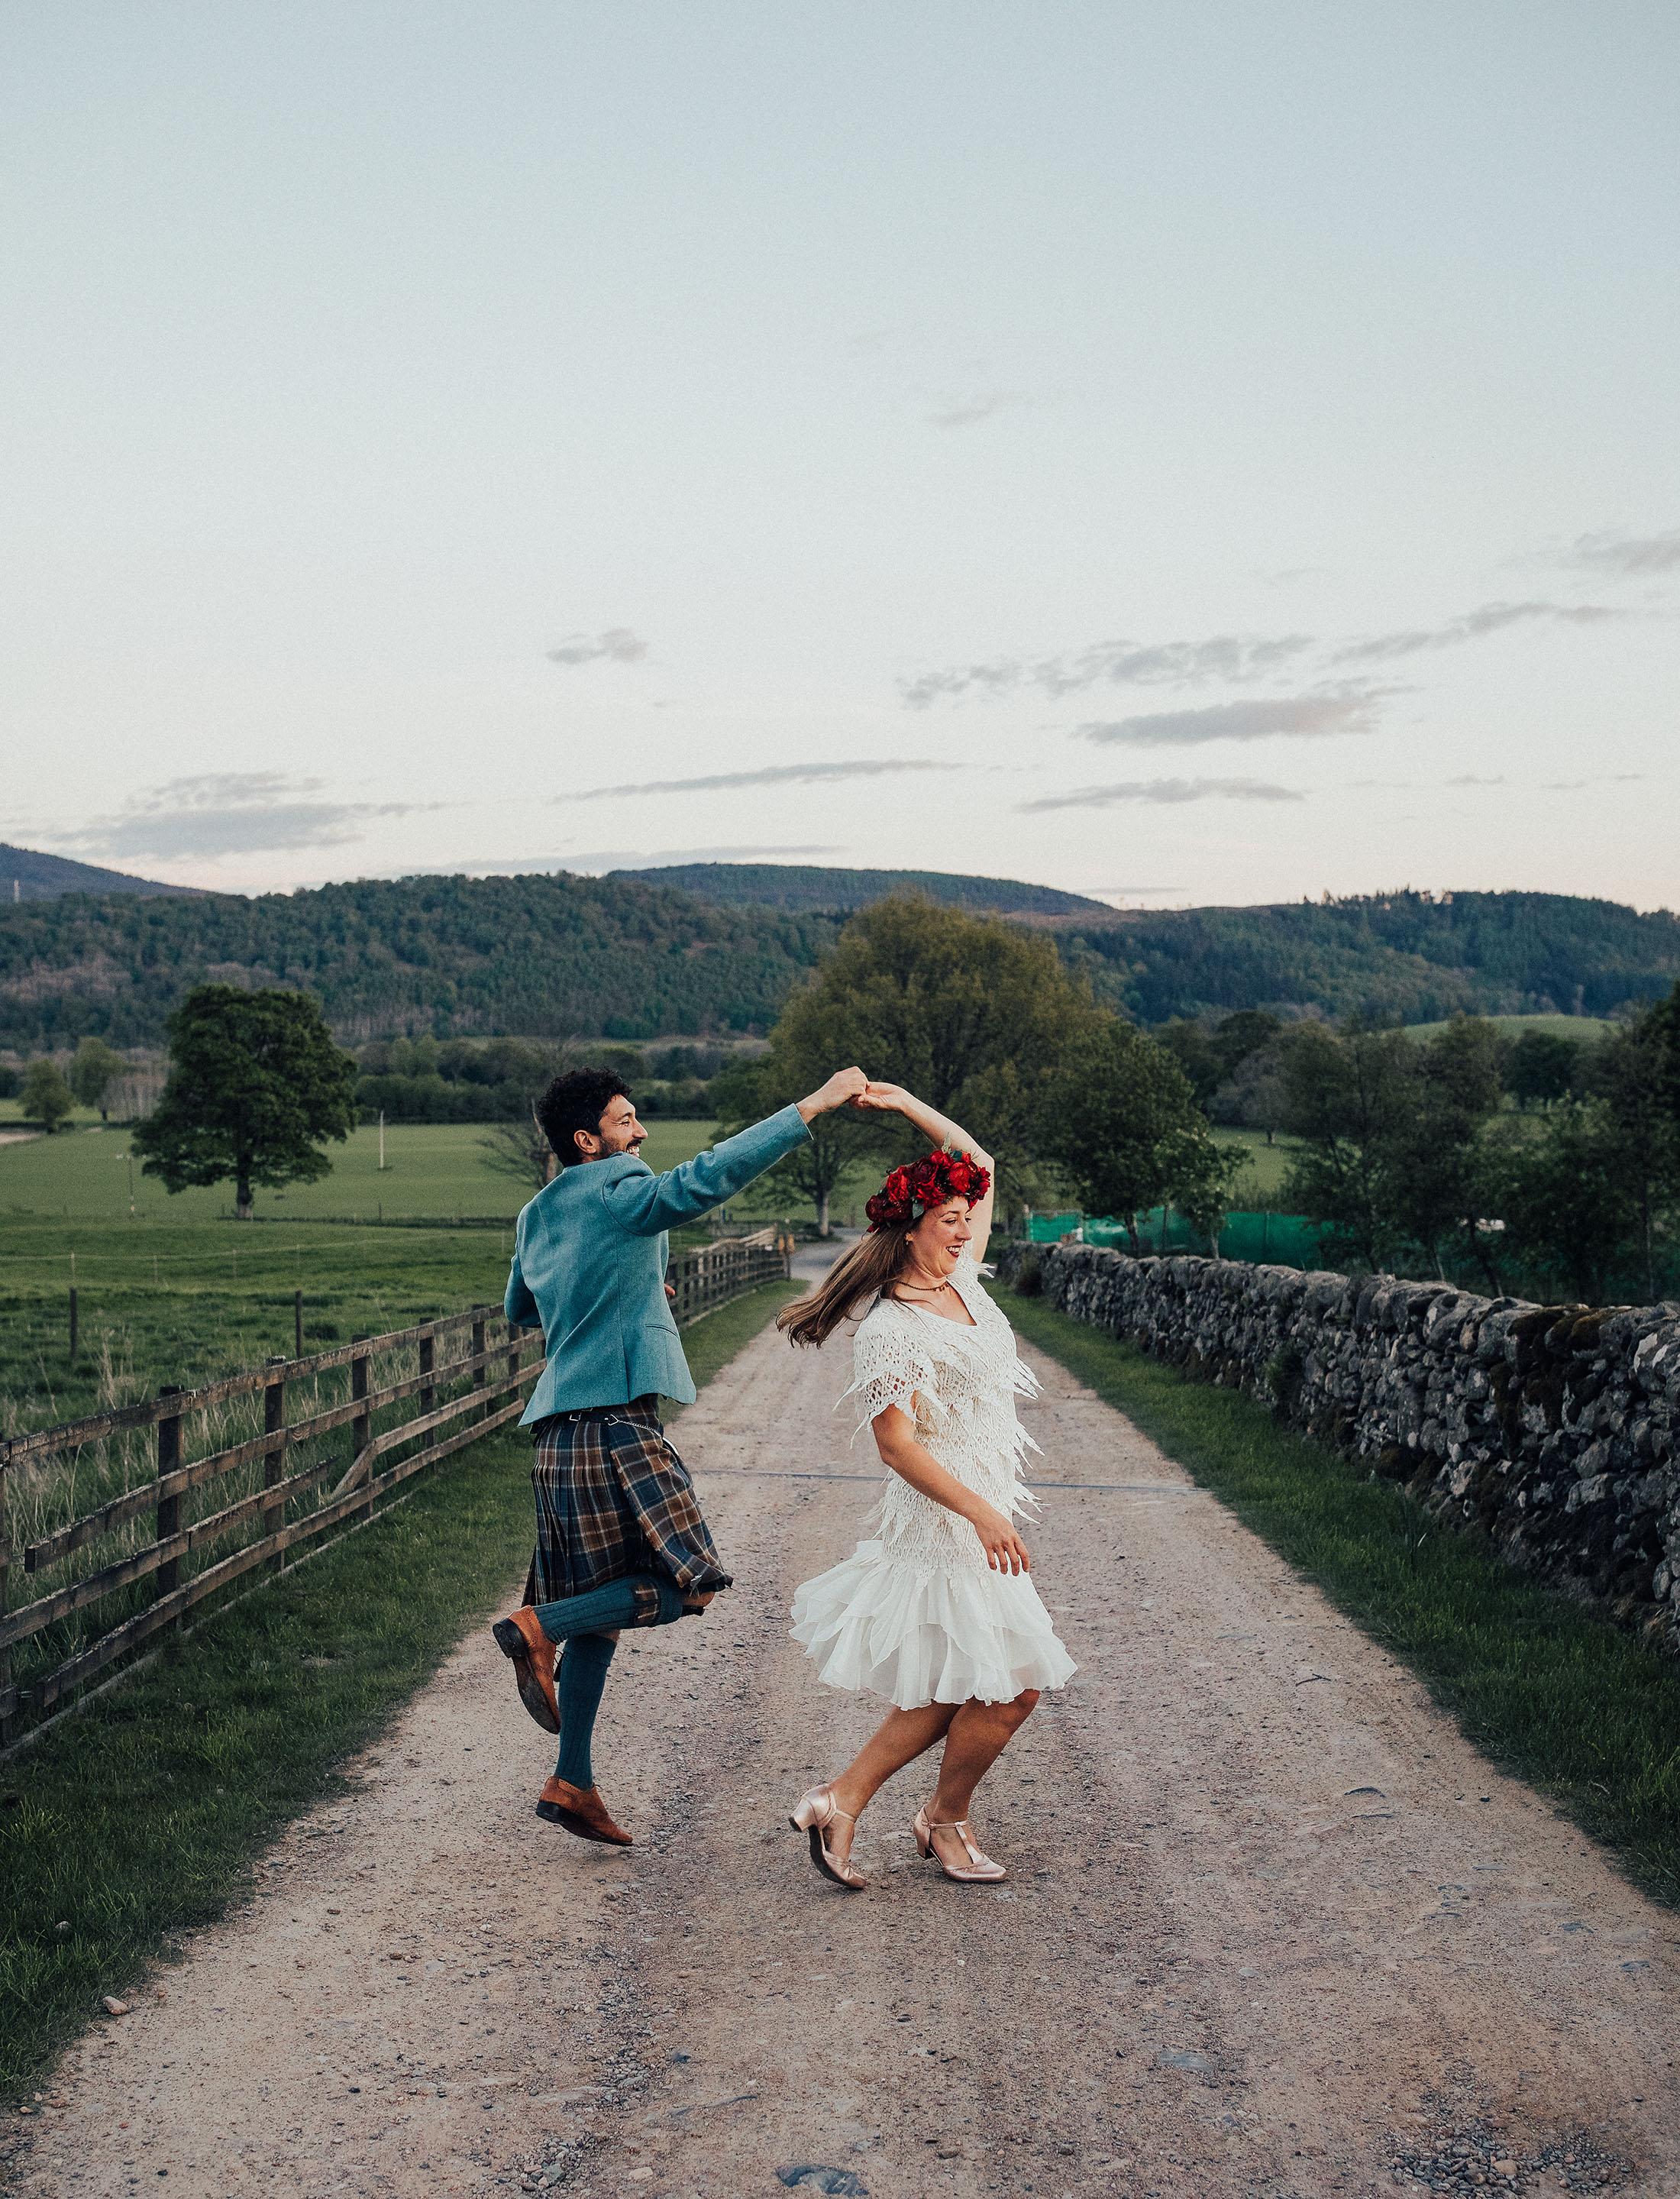 COMRIE_CROFT_WEDDINGS_PJ_PHILLIPS_PHOTOGRAPHY_192.jpg